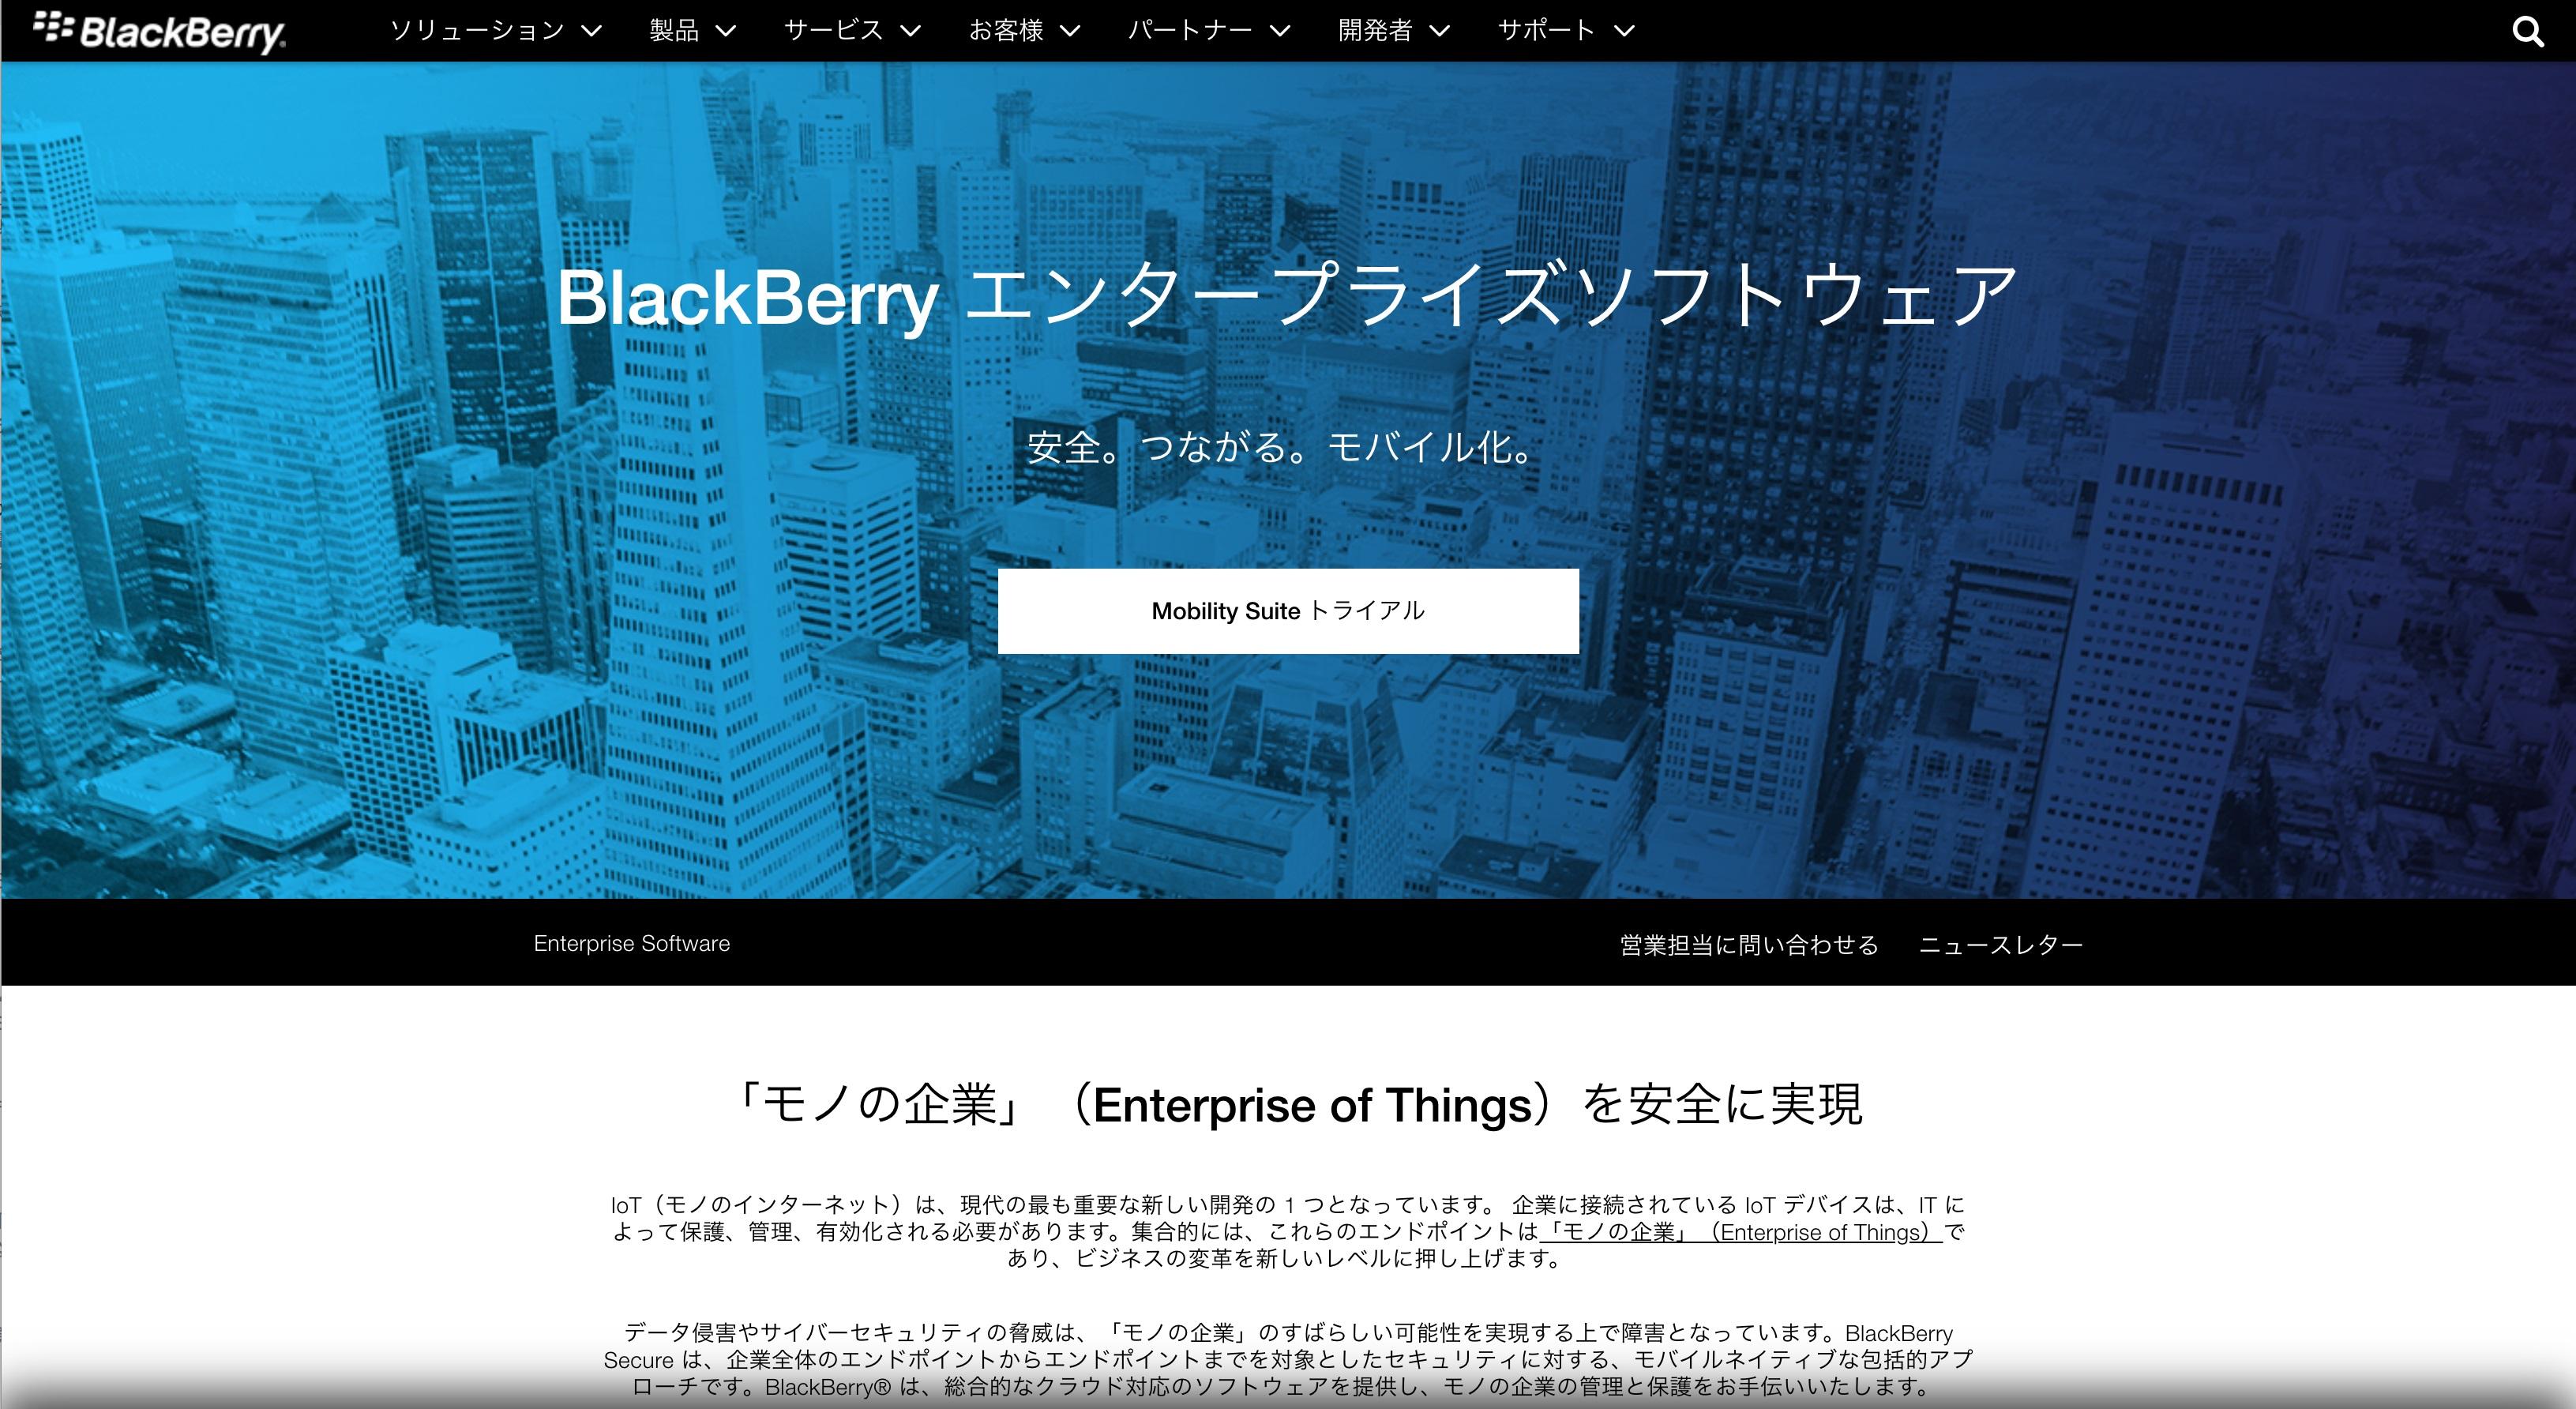 BlackBerry社のホームページ画像